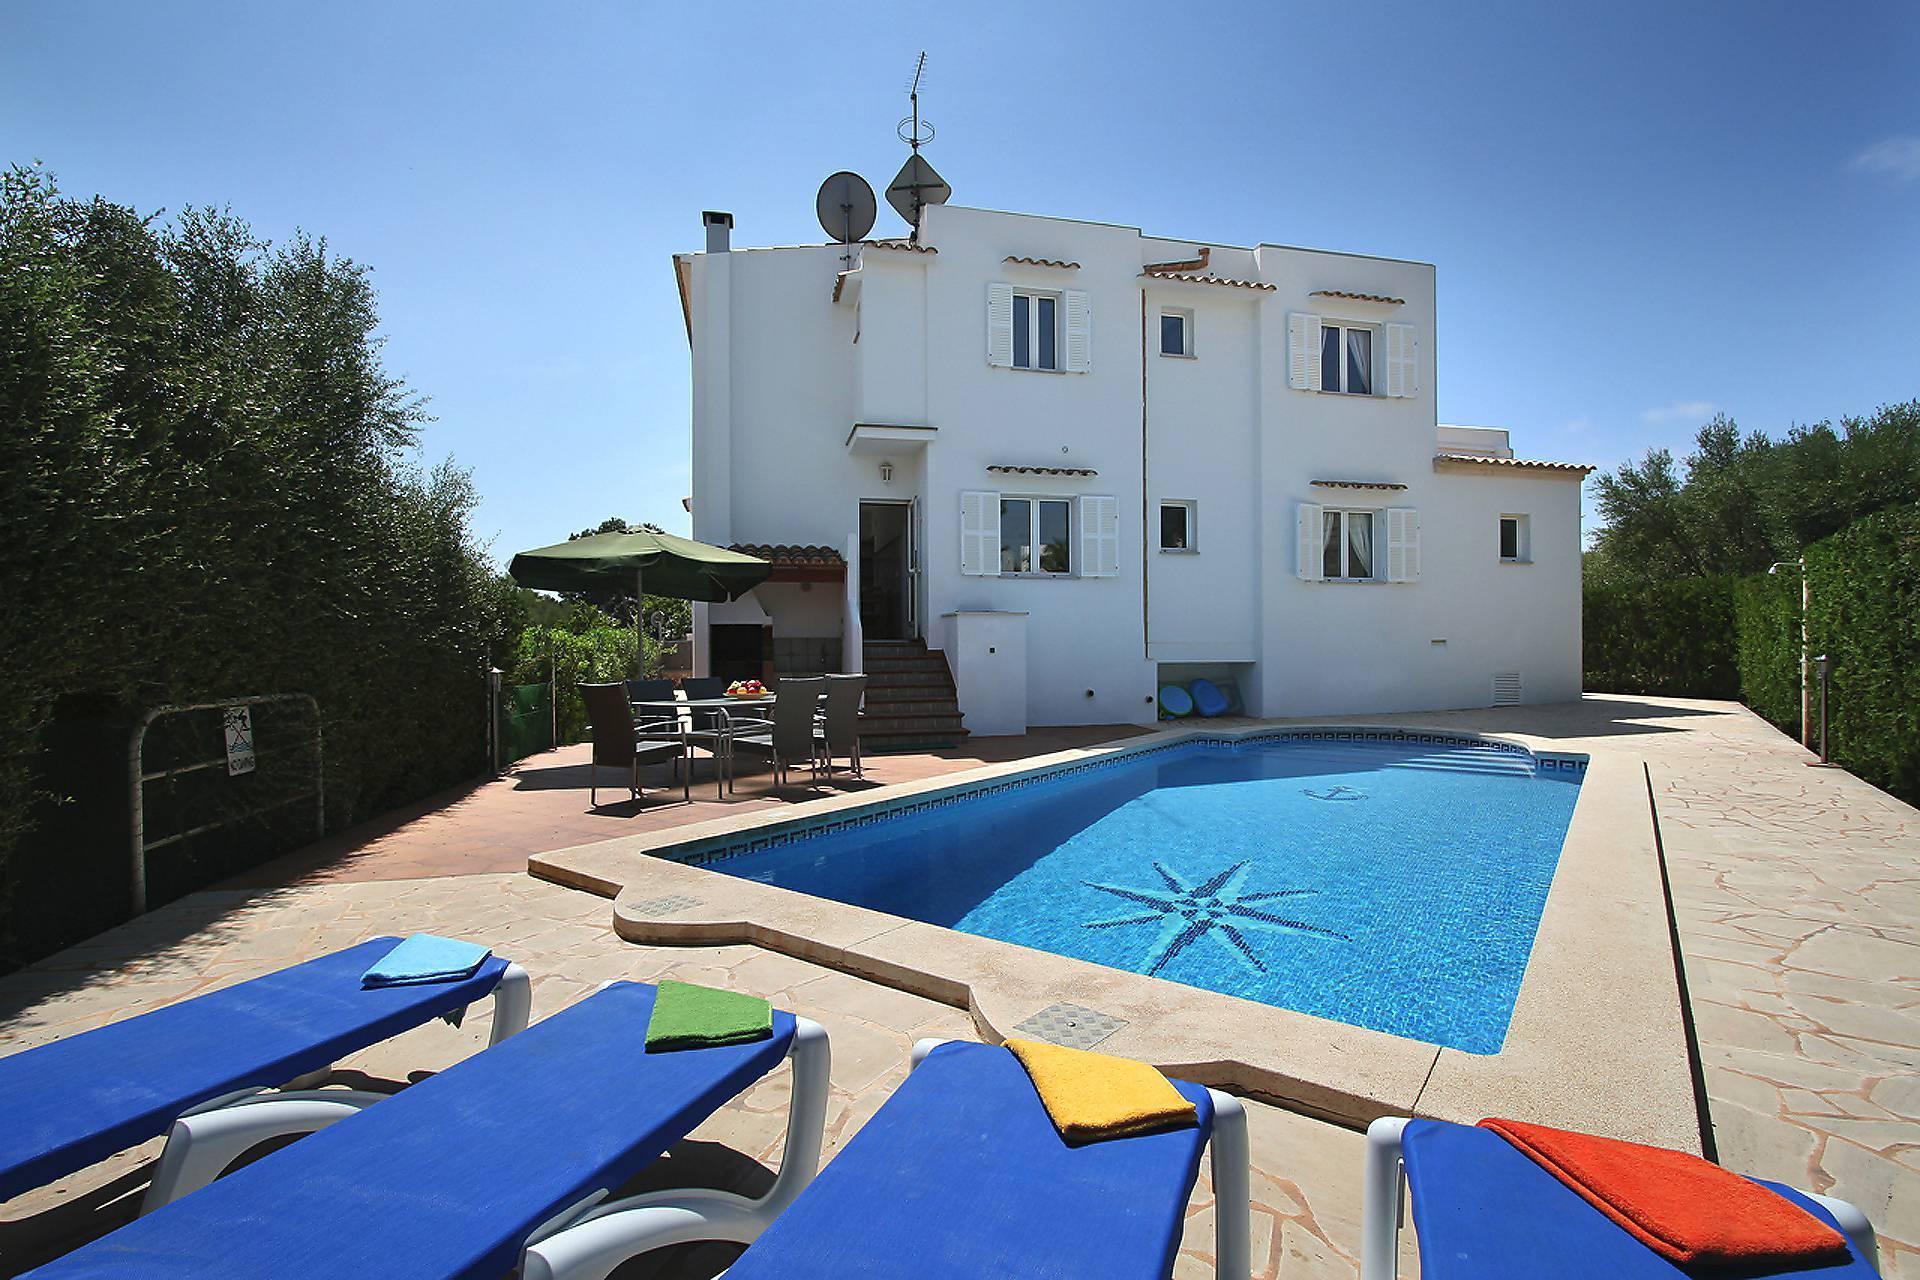 01-128 Rustic holiday home Majorca East Bild 5